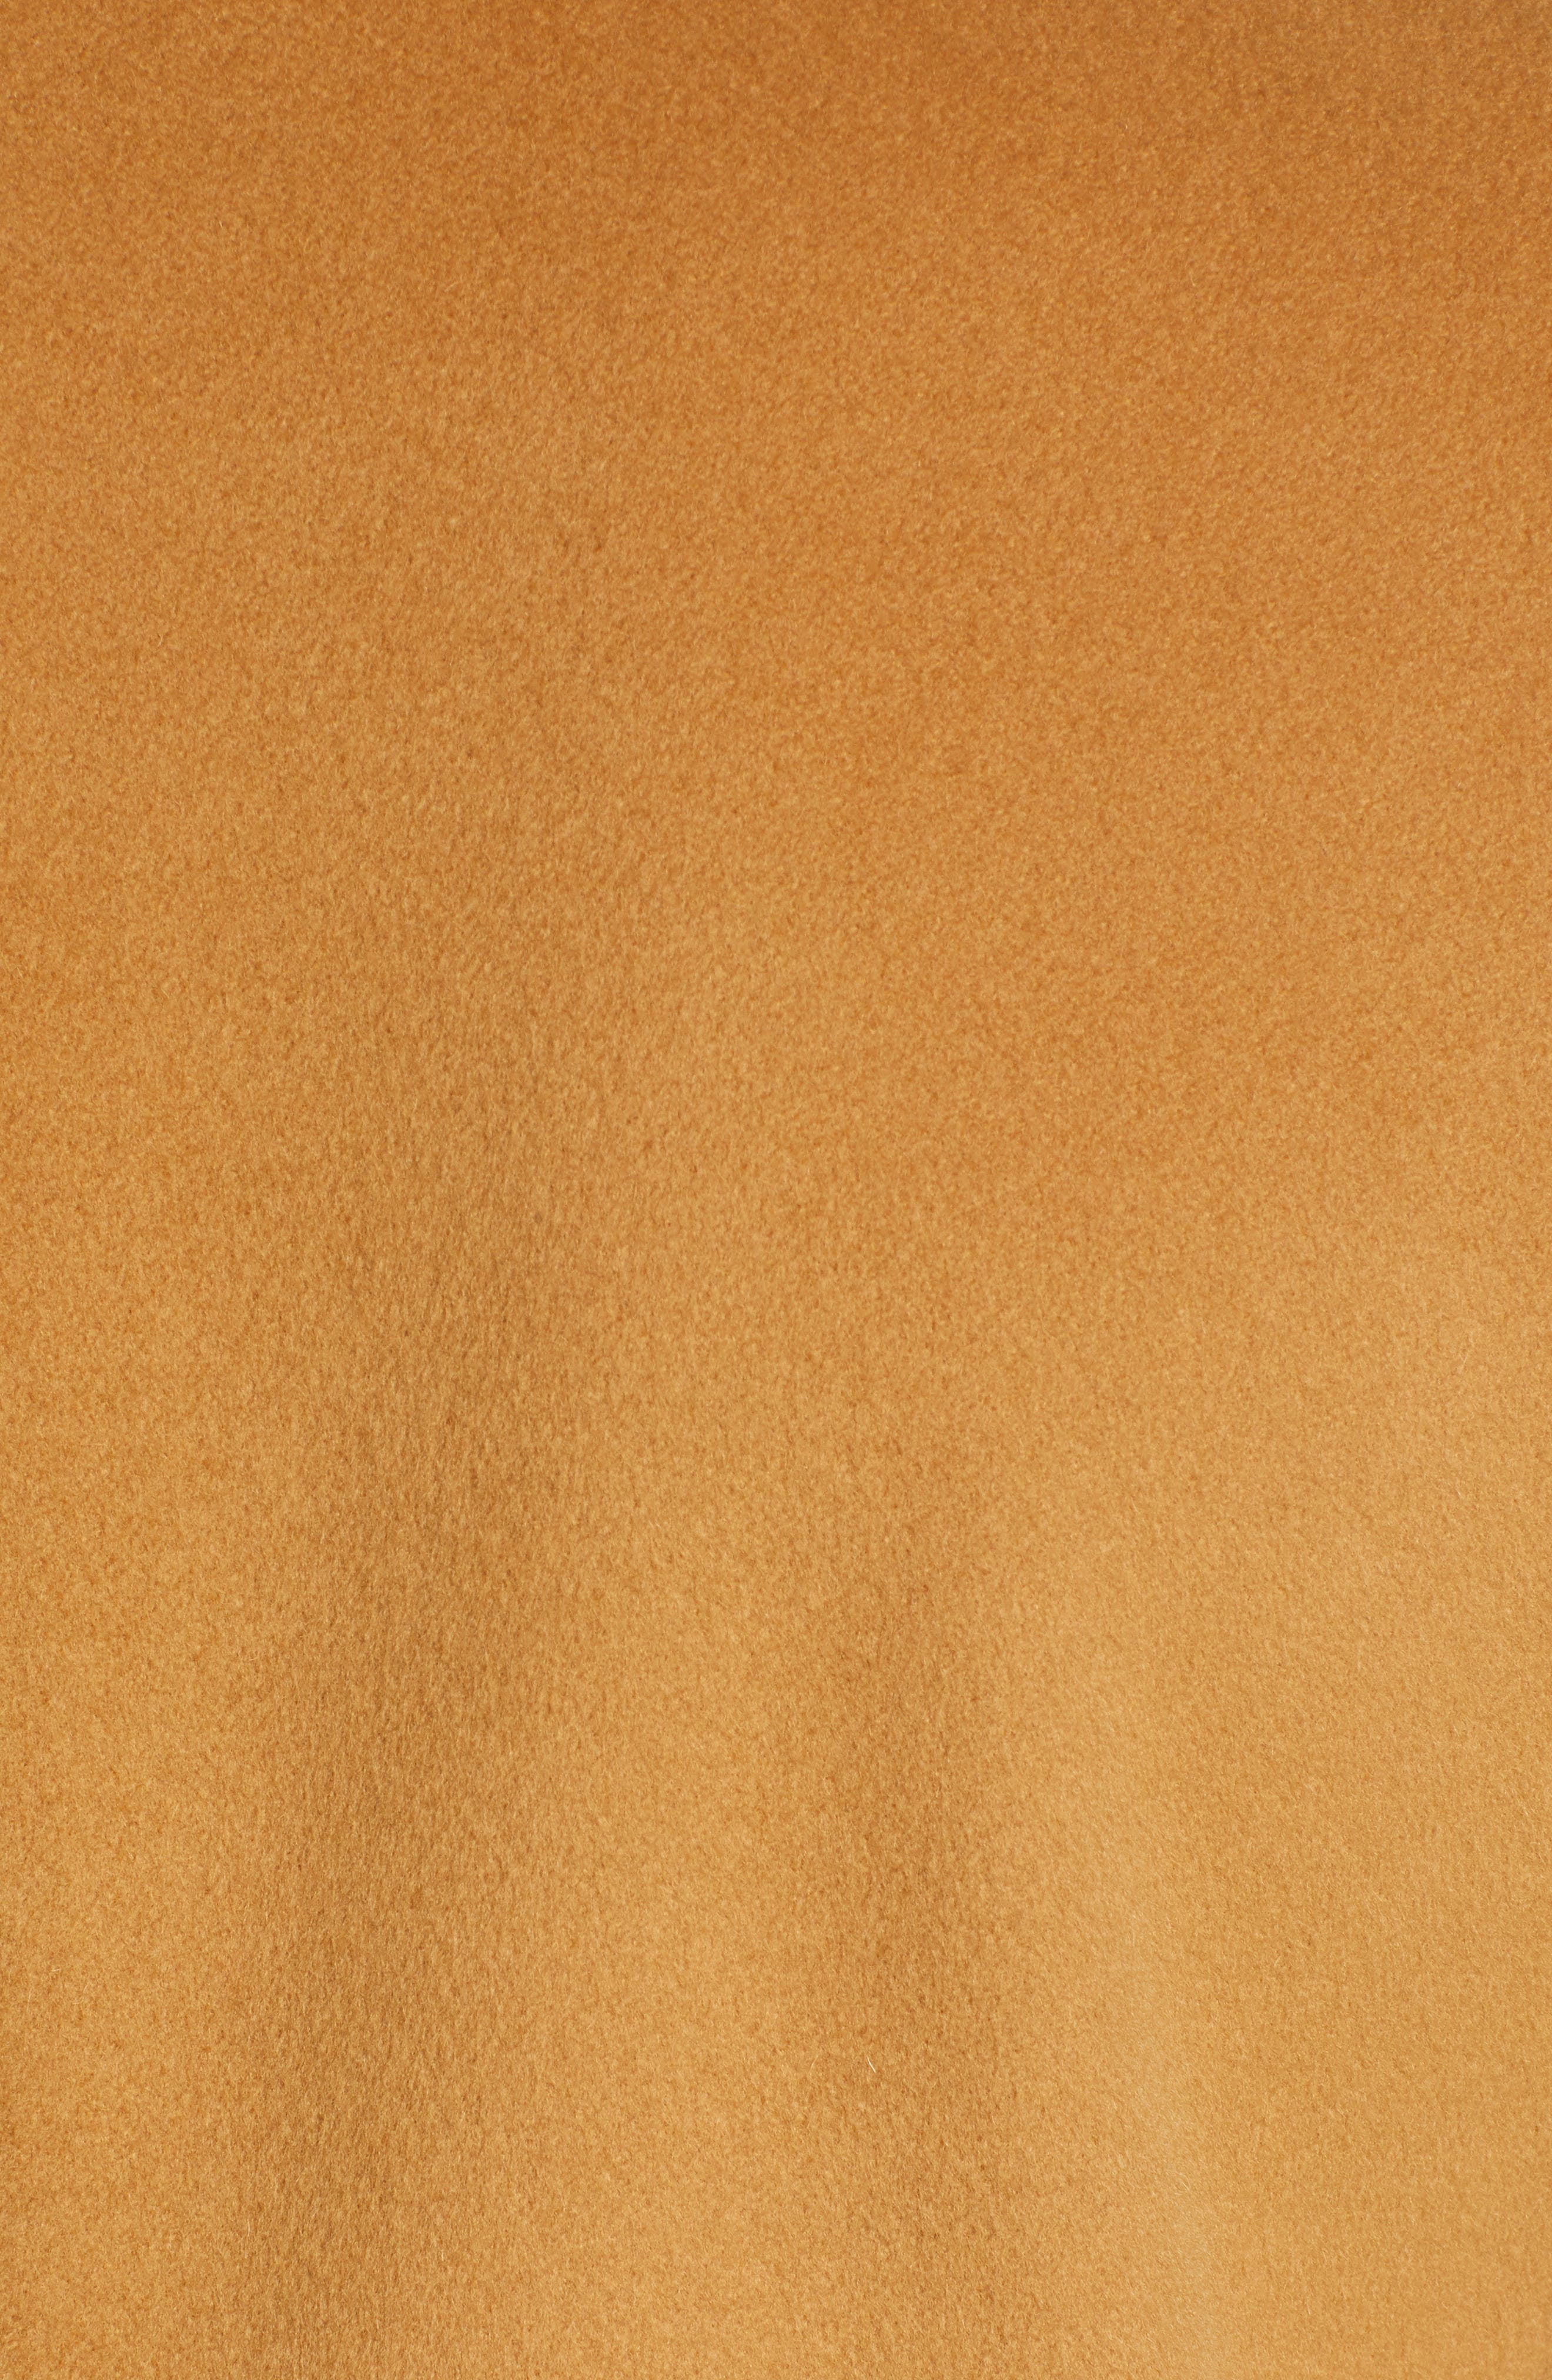 Lambswool Topcoat,                             Alternate thumbnail 6, color,                             252